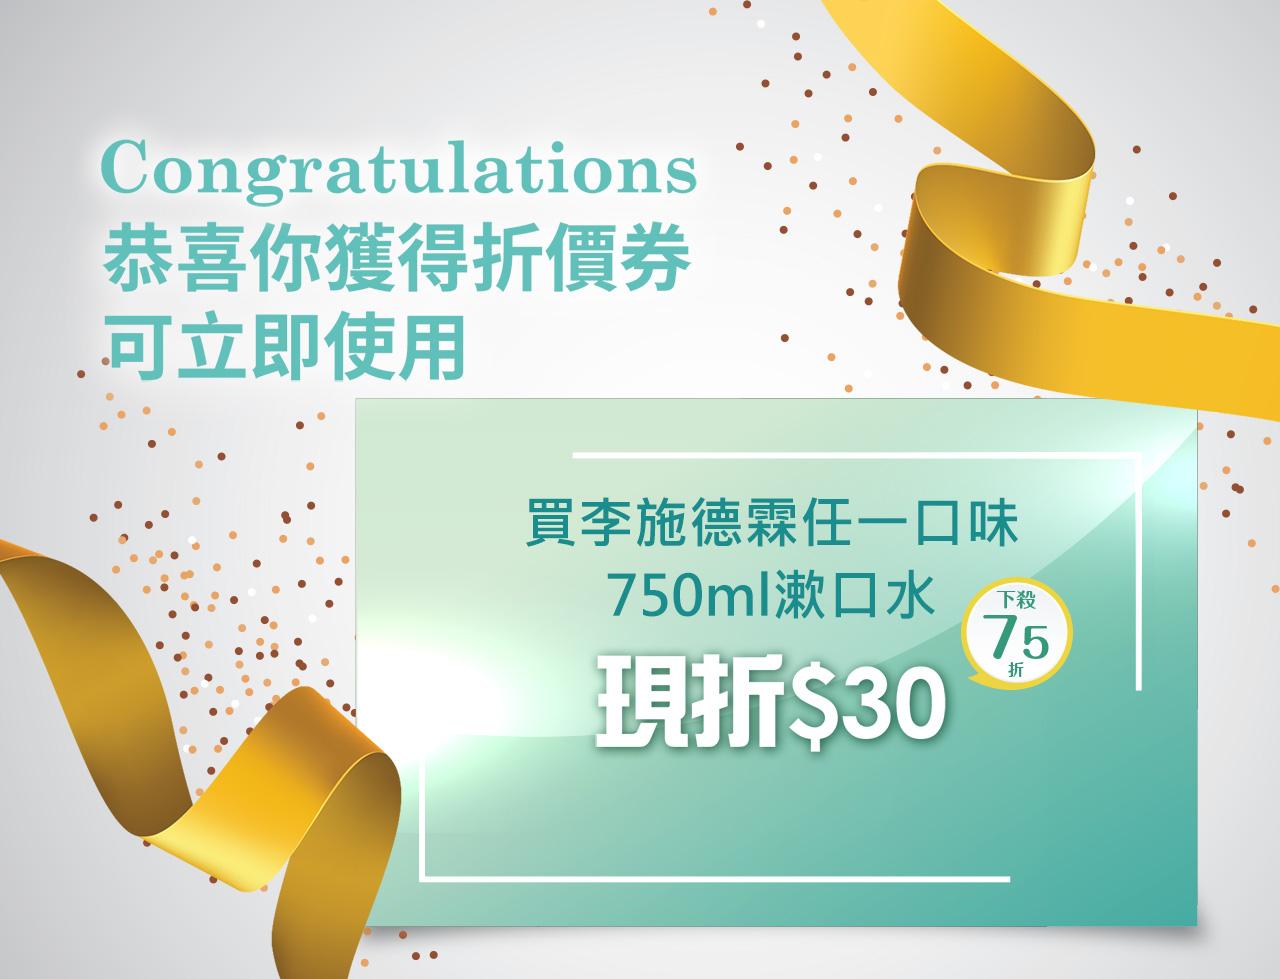 Congratulations 恭喜你獲得折價券 可立即使用